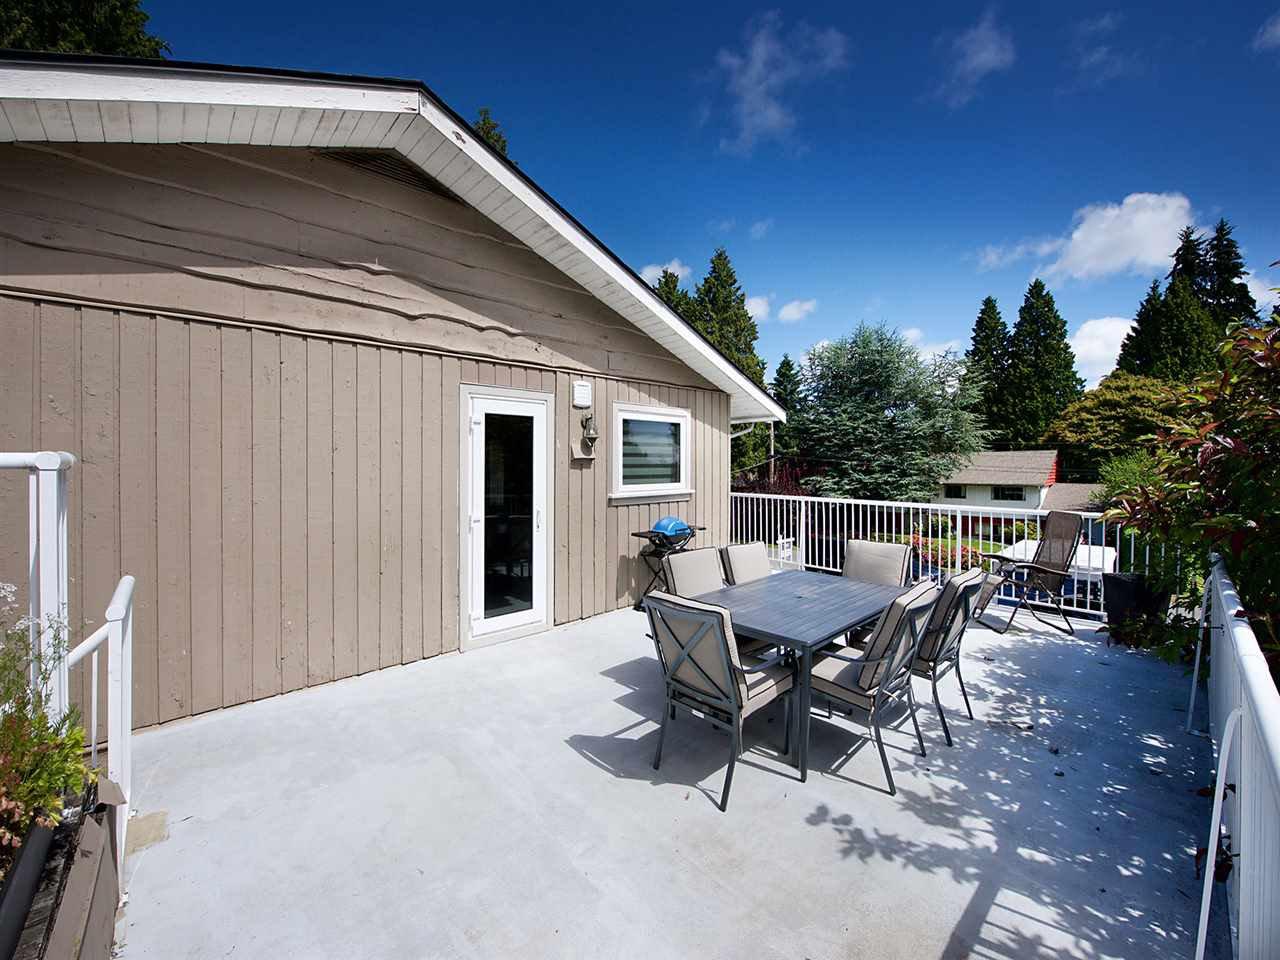 Photo 17: Photos: 1067 WILMINGTON Drive in Delta: Tsawwassen Central House for sale (Tsawwassen)  : MLS®# R2090180